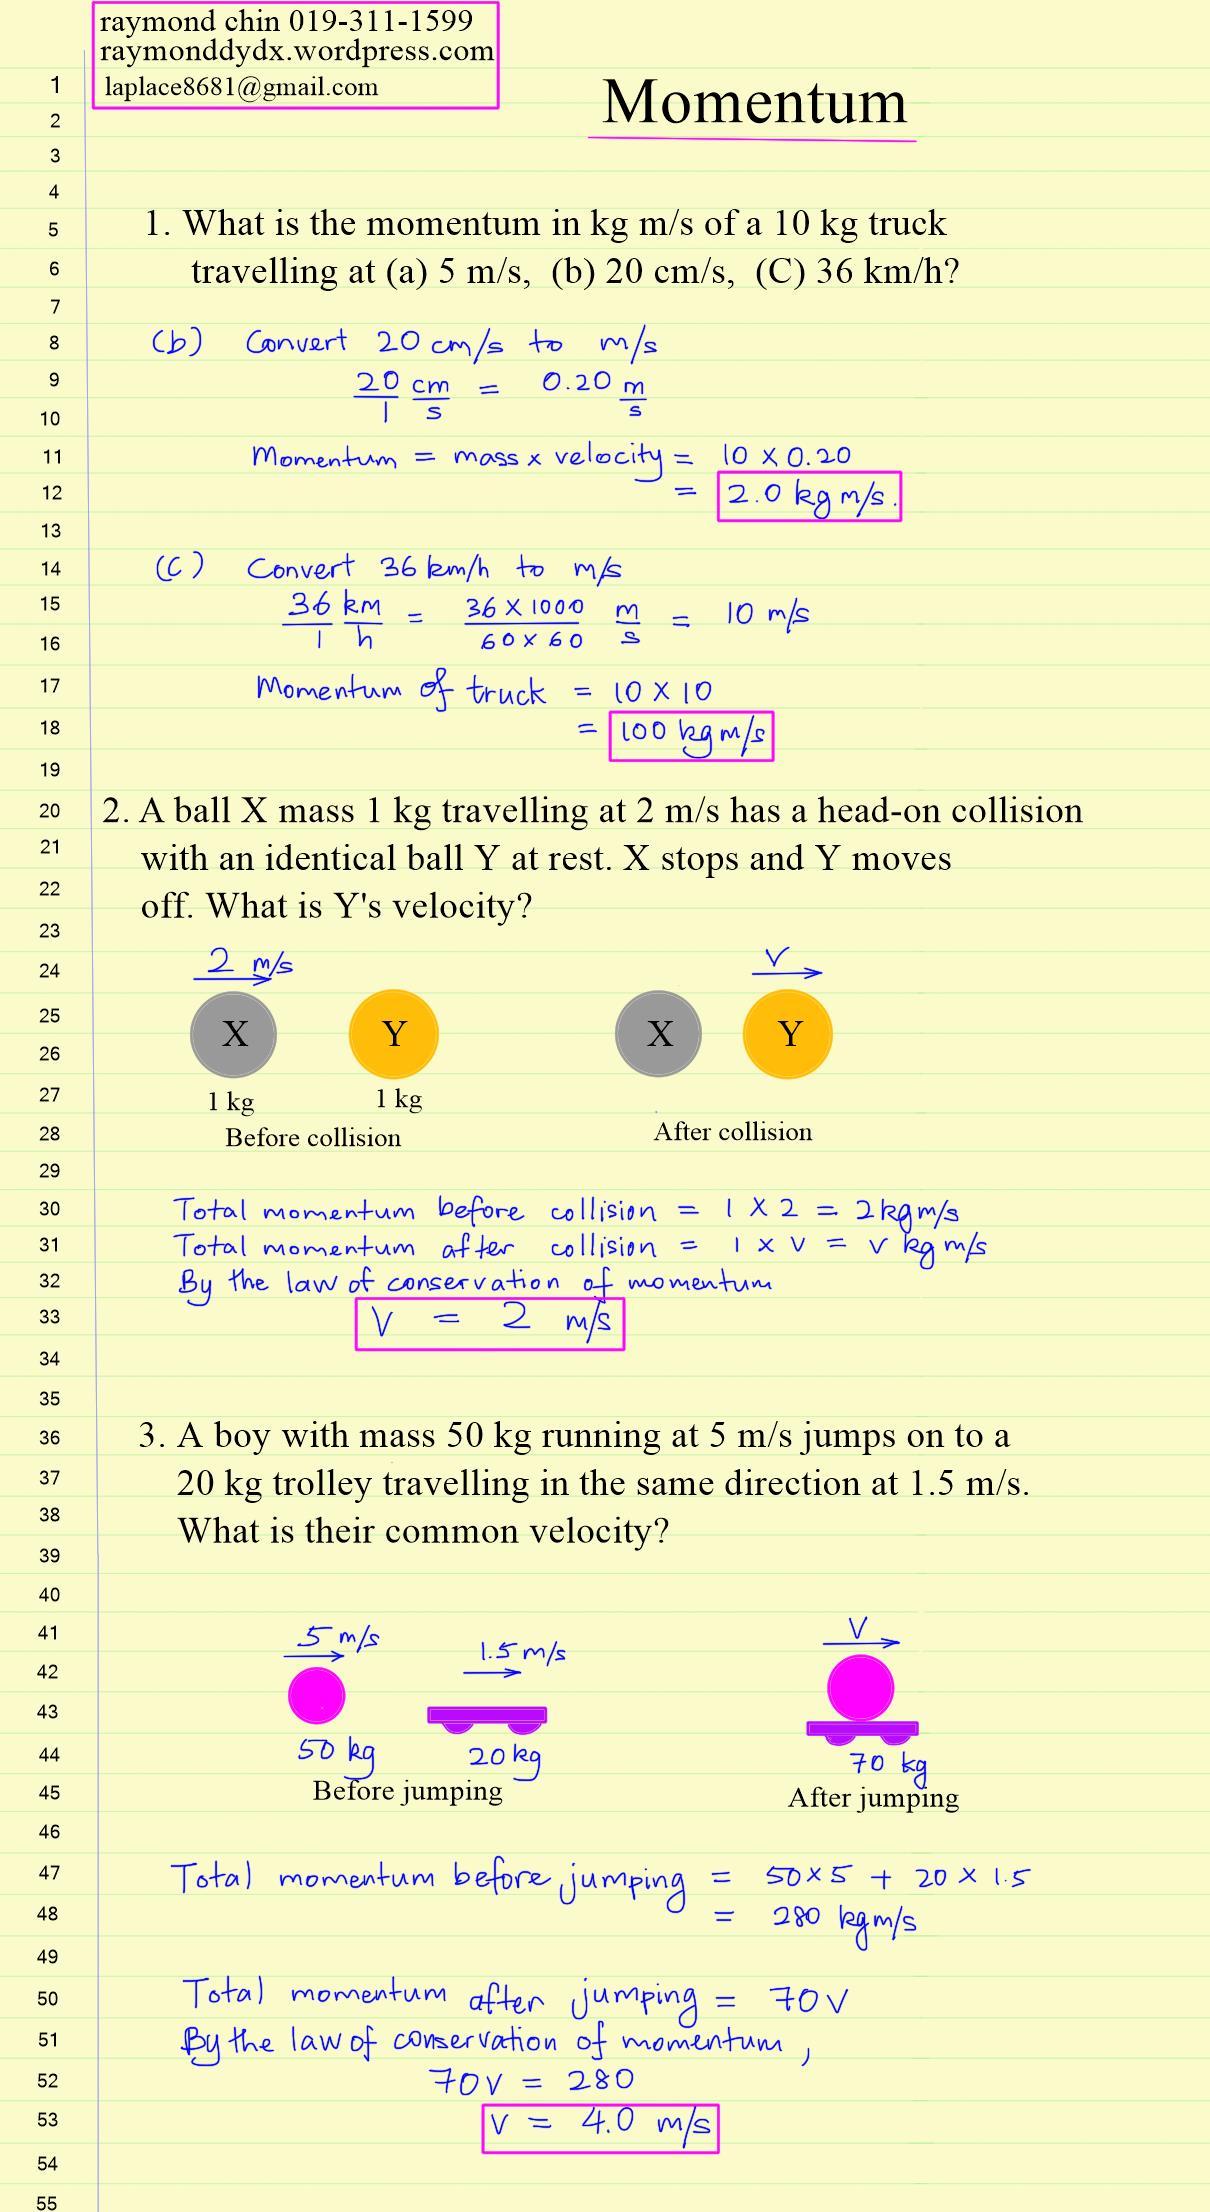 Igcse Ib Momentum Worksheet Physics And Maths Tuition